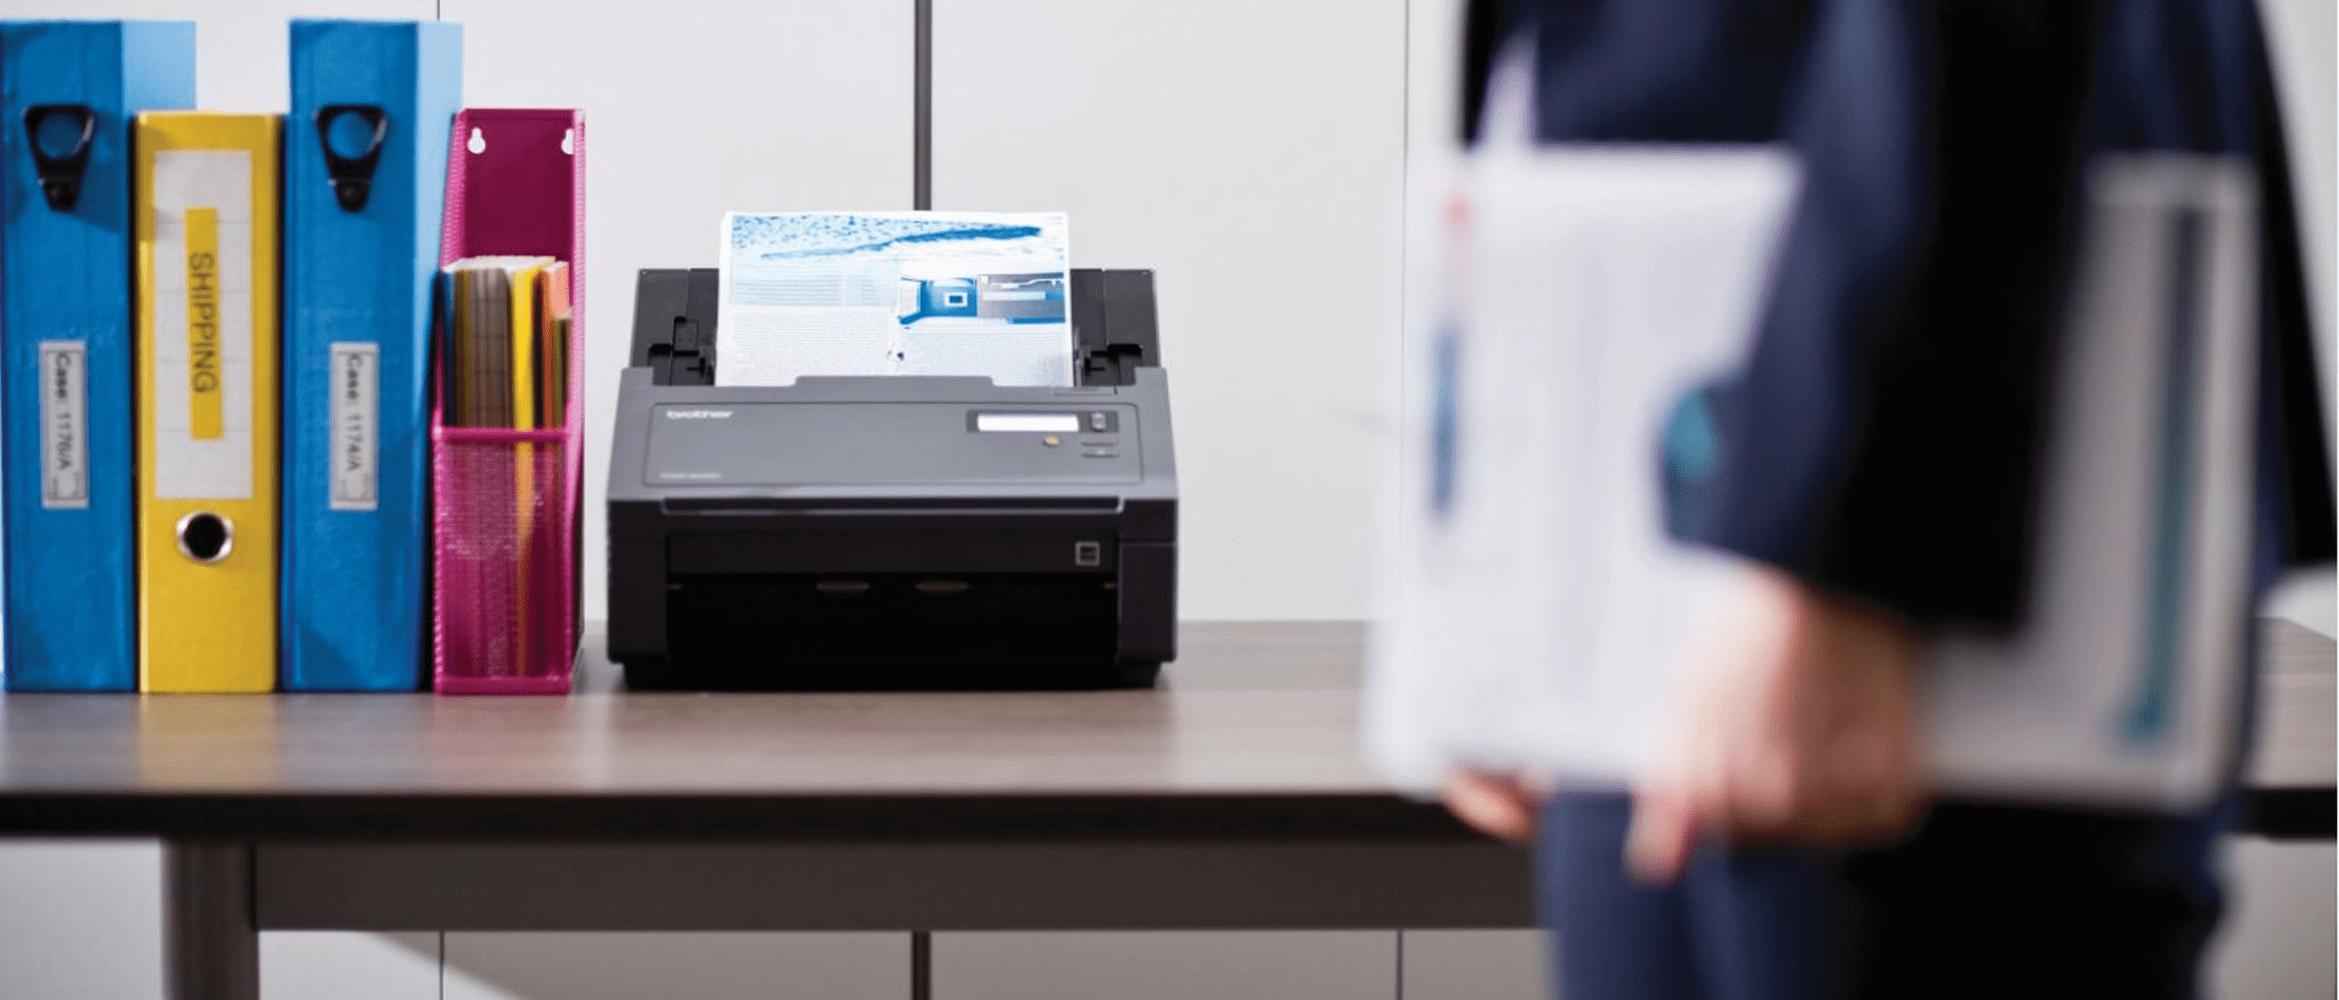 Stolný skener na poličke